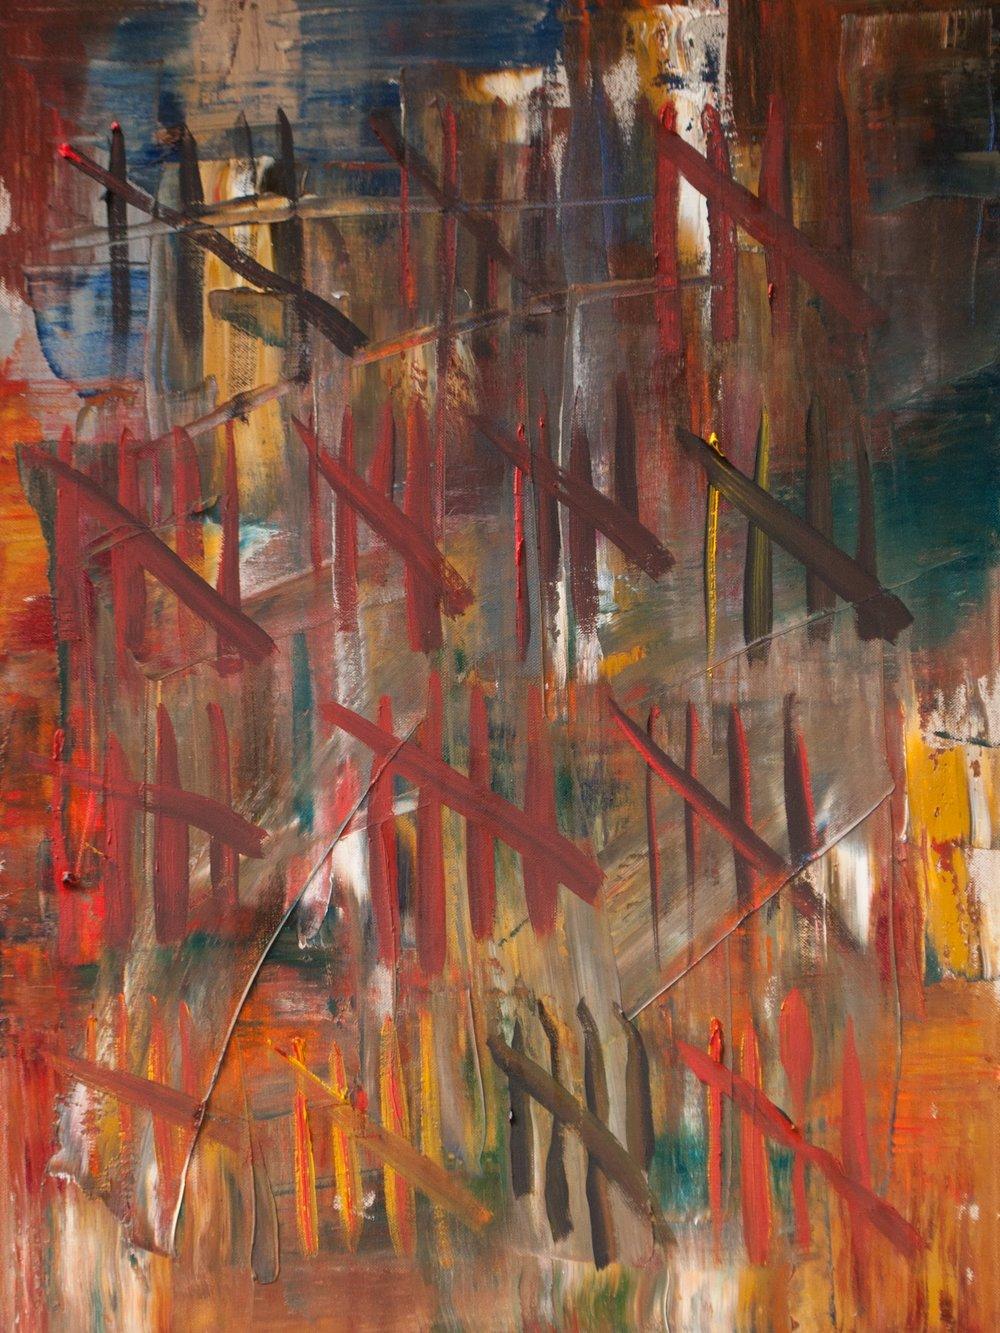 Relentless, 24 x 18 Oil on Canvas, 2014